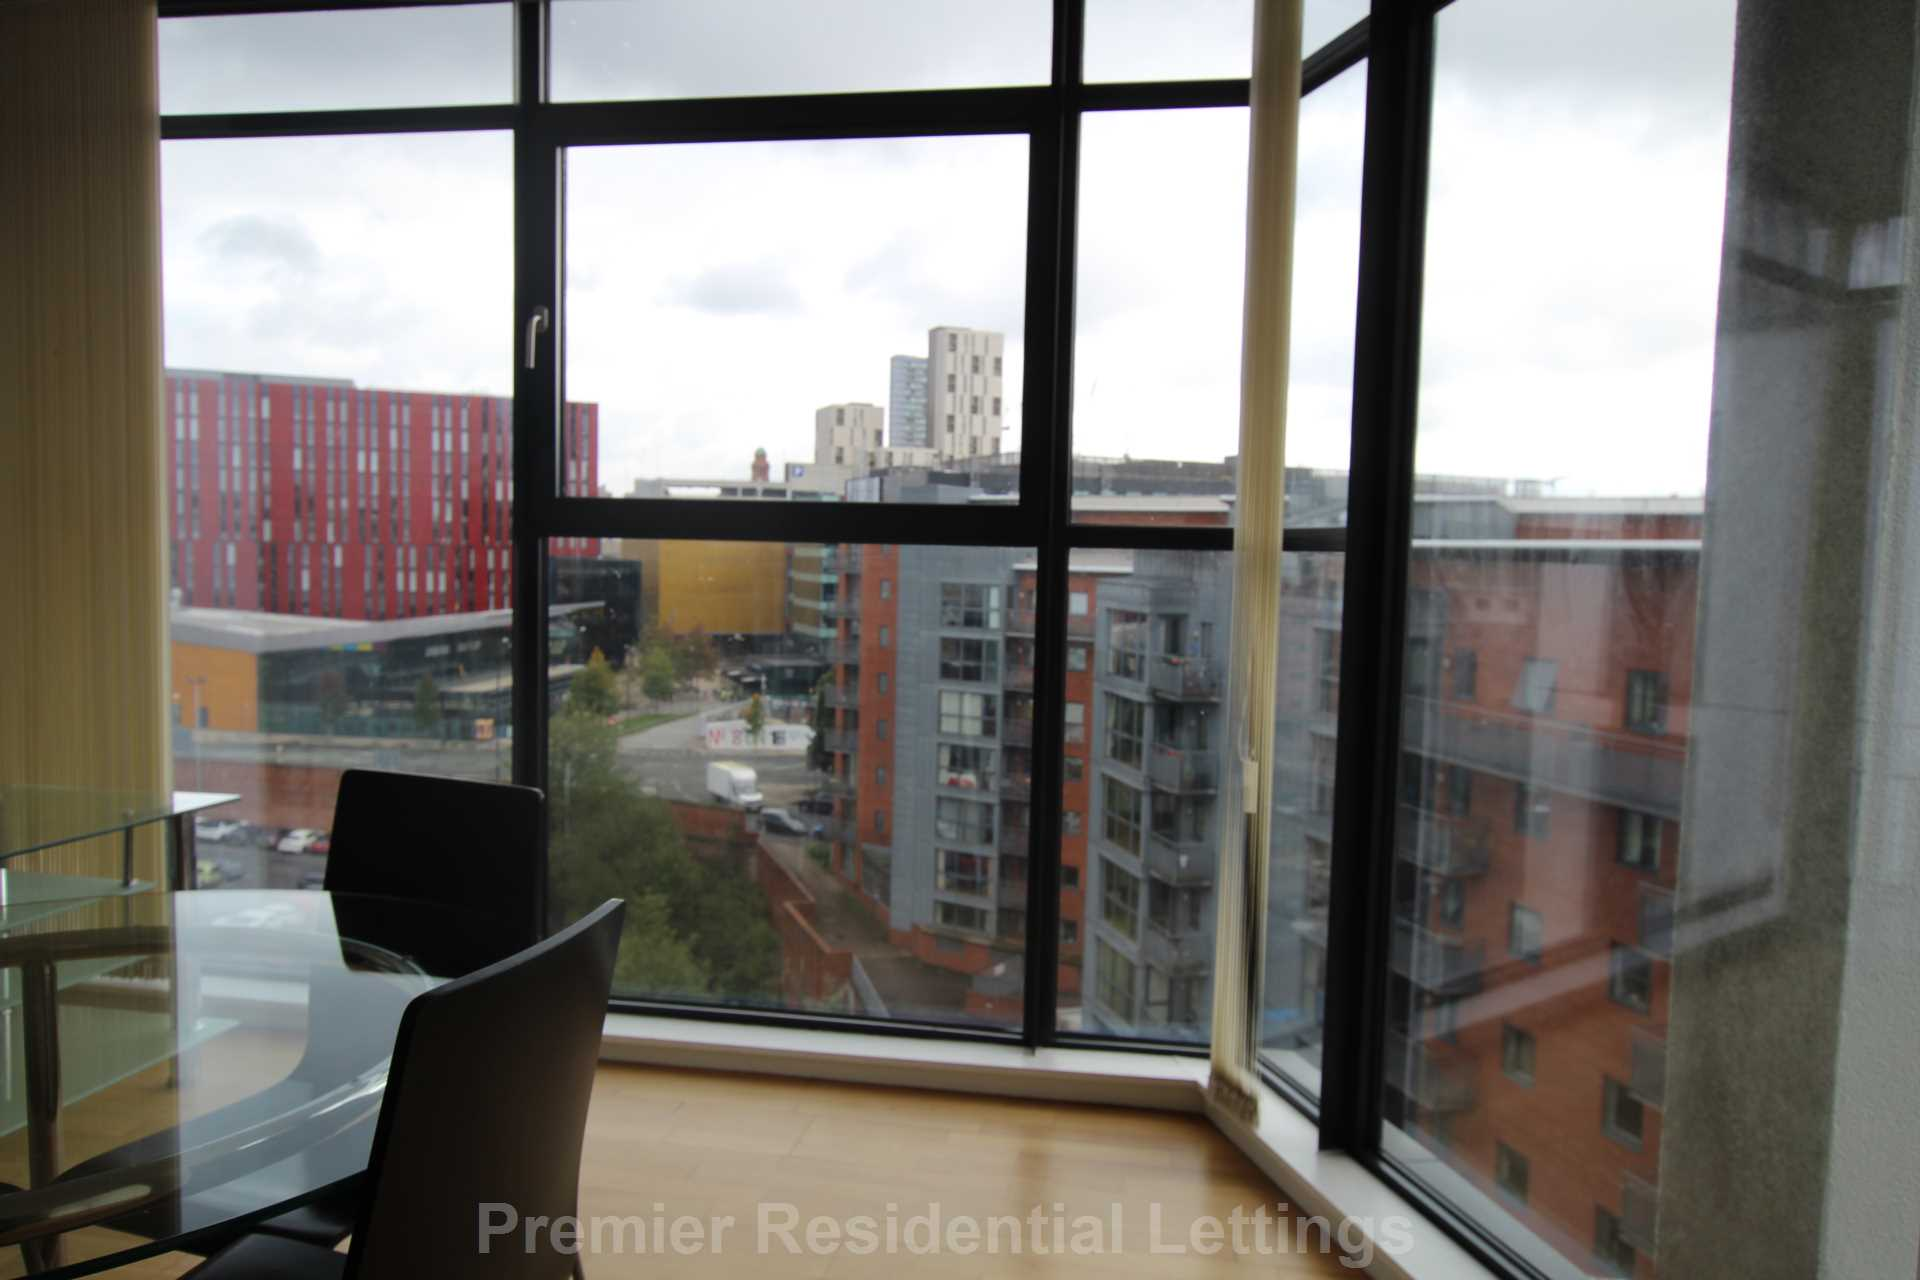 Hill Quays, Jordan Street, Manchester, Image 9